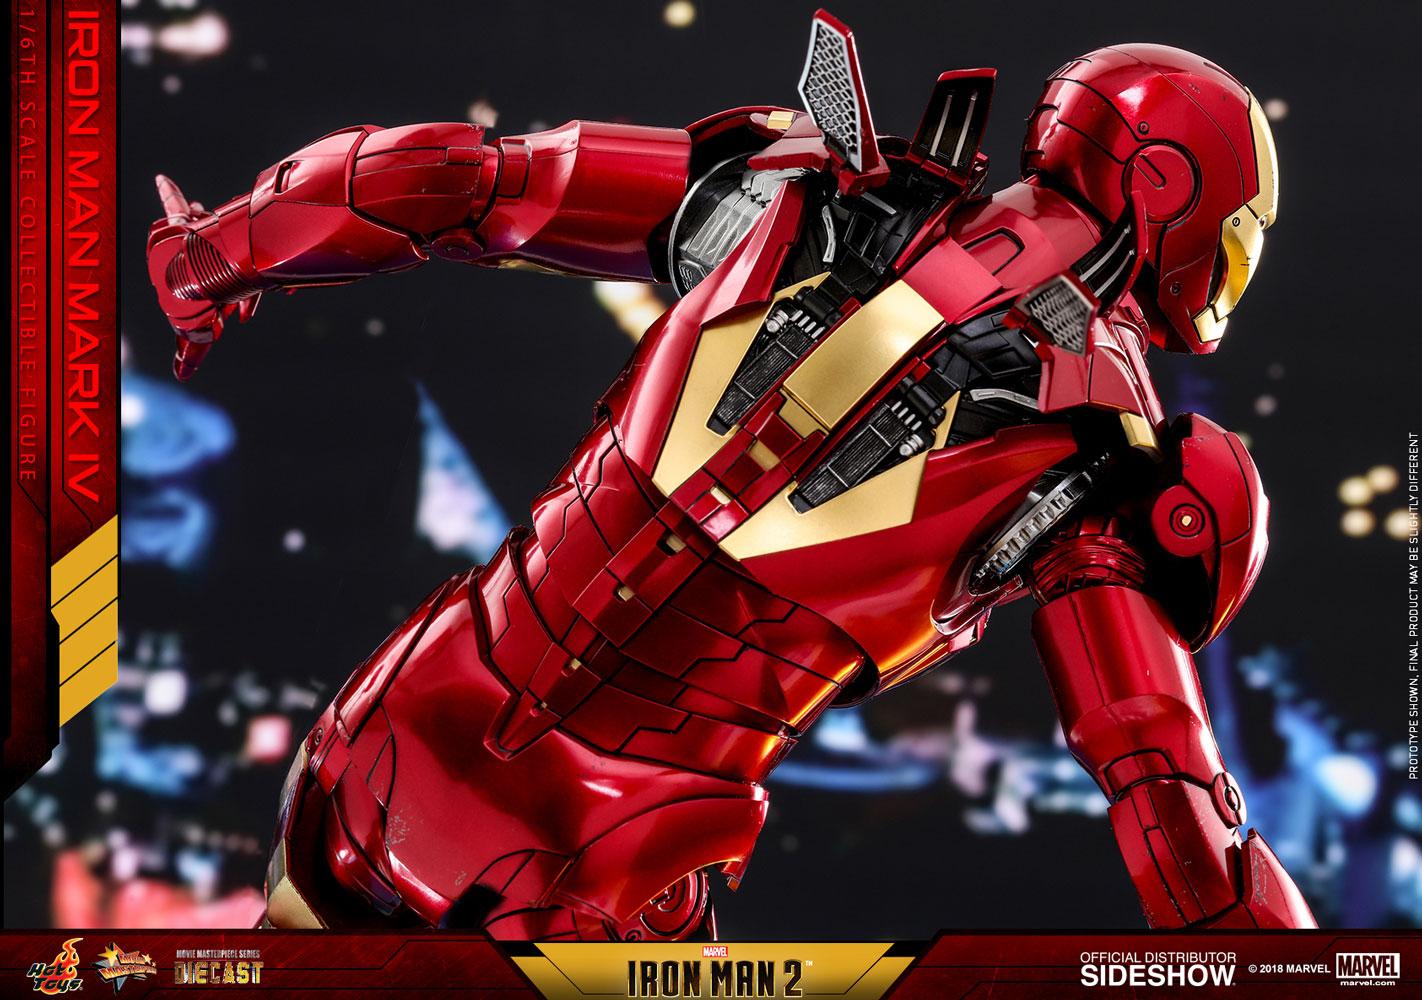 Link a marvel-iron-man-2-iron-man-mark-4-sixth-scale-figure-hot-toys-903340-09